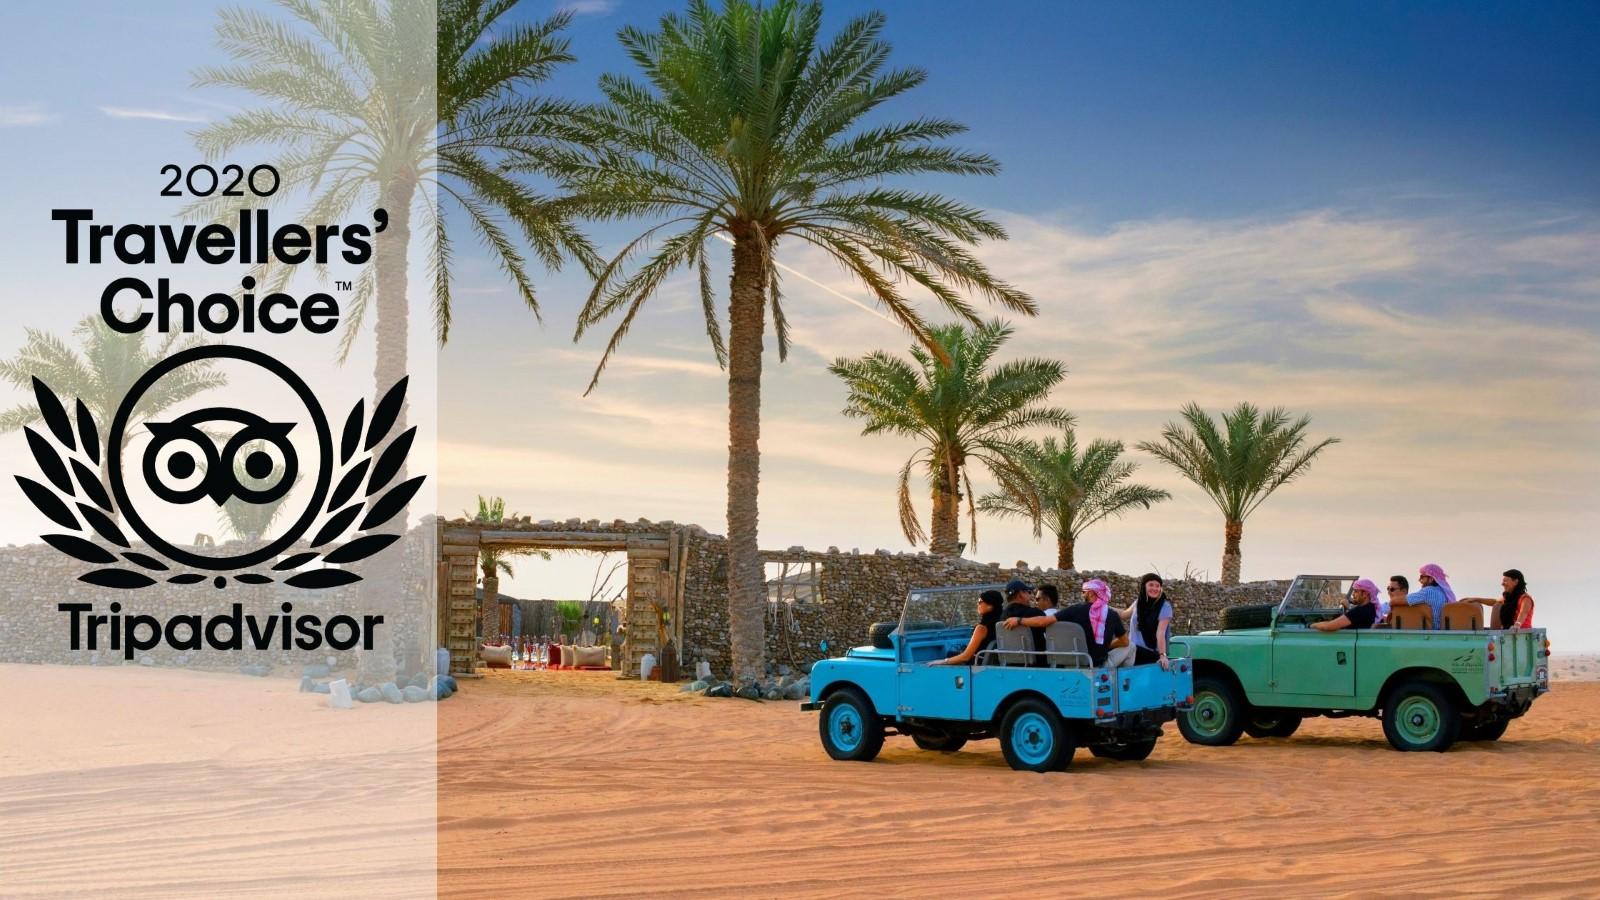 Platinum Heritage wins 2020 Tripadvisor Travellers' Choice Award.